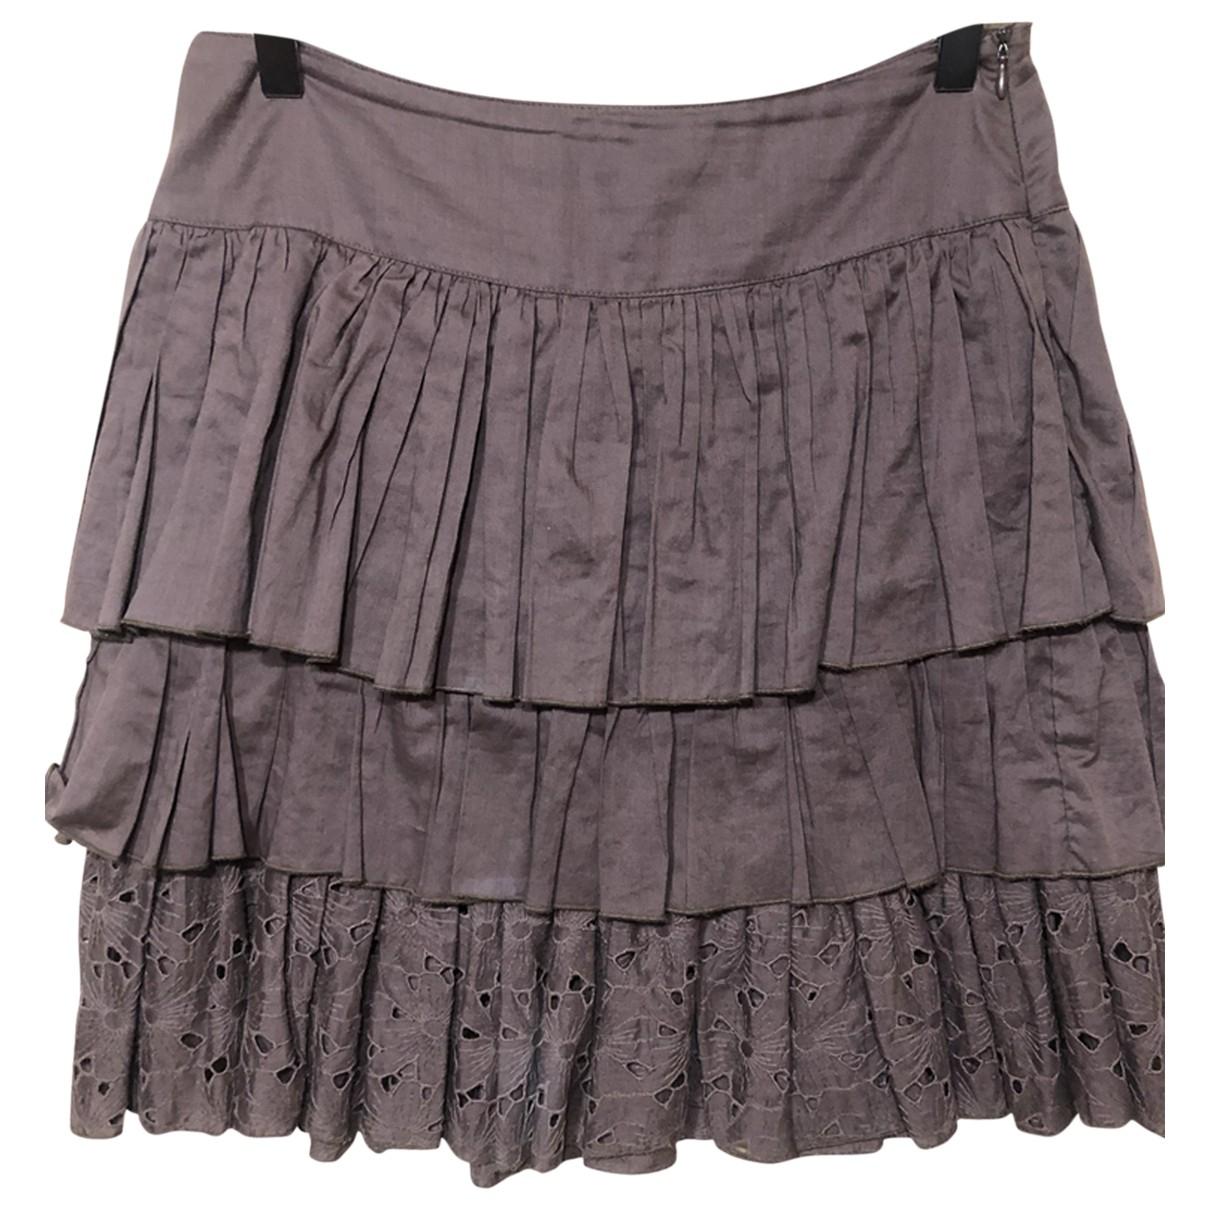 Blumarine N Brown Cotton skirt for Women 40 IT